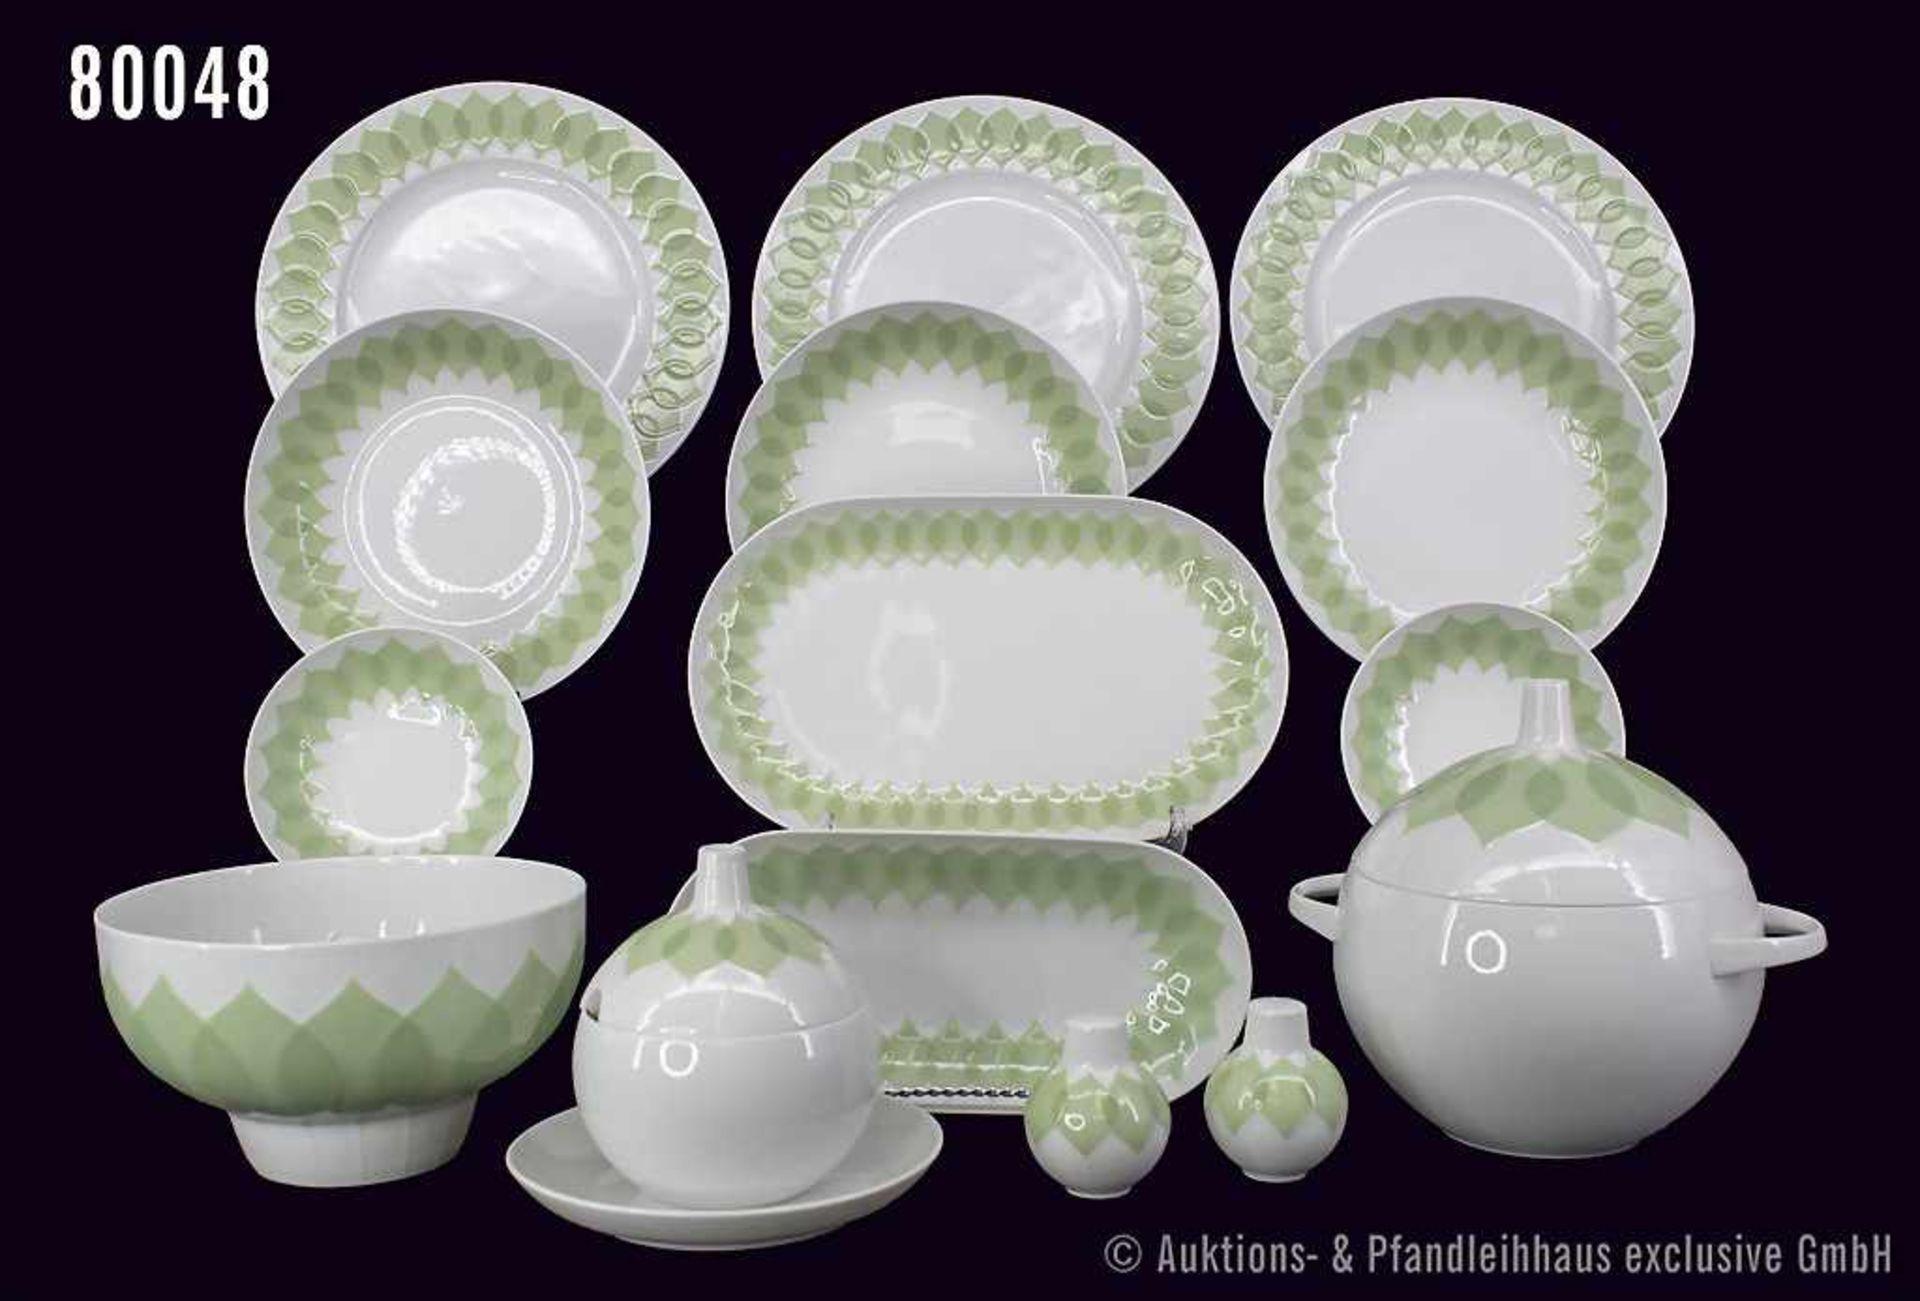 Konv. Rosenthal Porzellan, 32 Teile, Rosenthal studio-linie, Serie Lotus, Dekor Secunda grün,